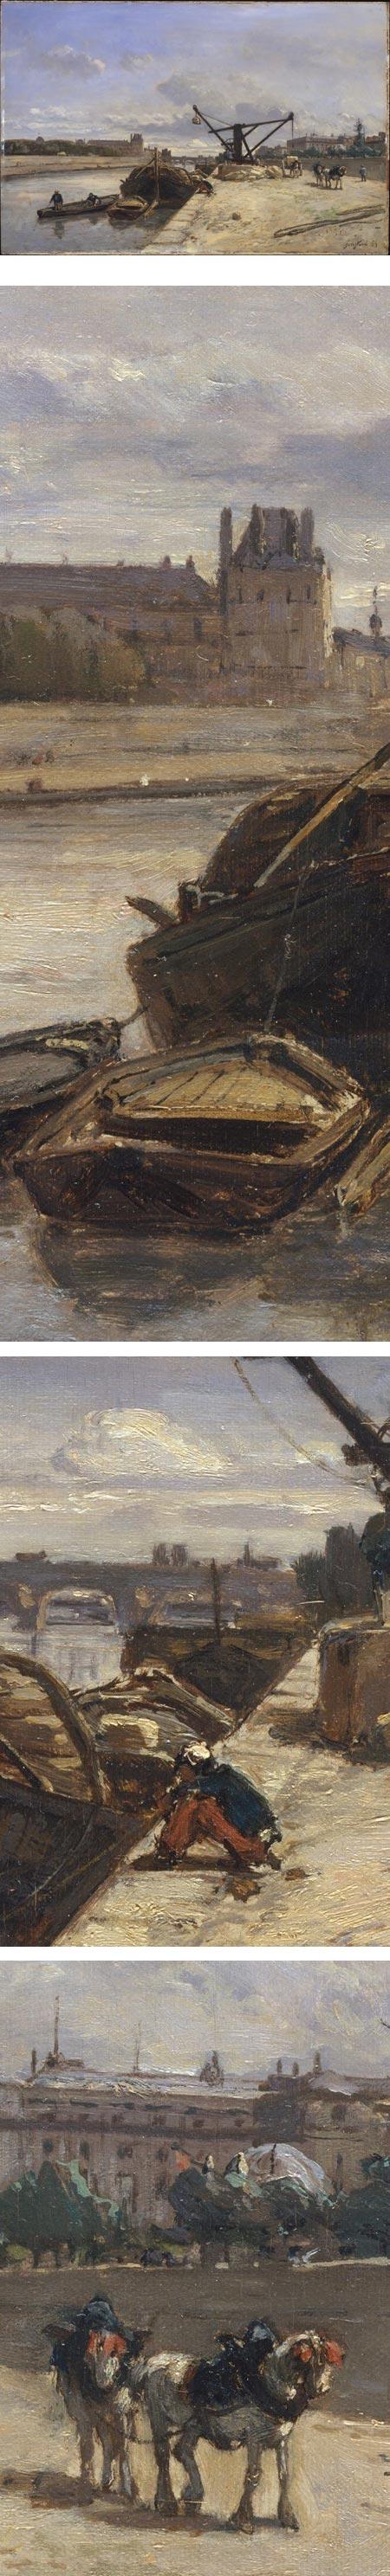 View from the Quai d'Orsay, Johan Barthold Jongkind